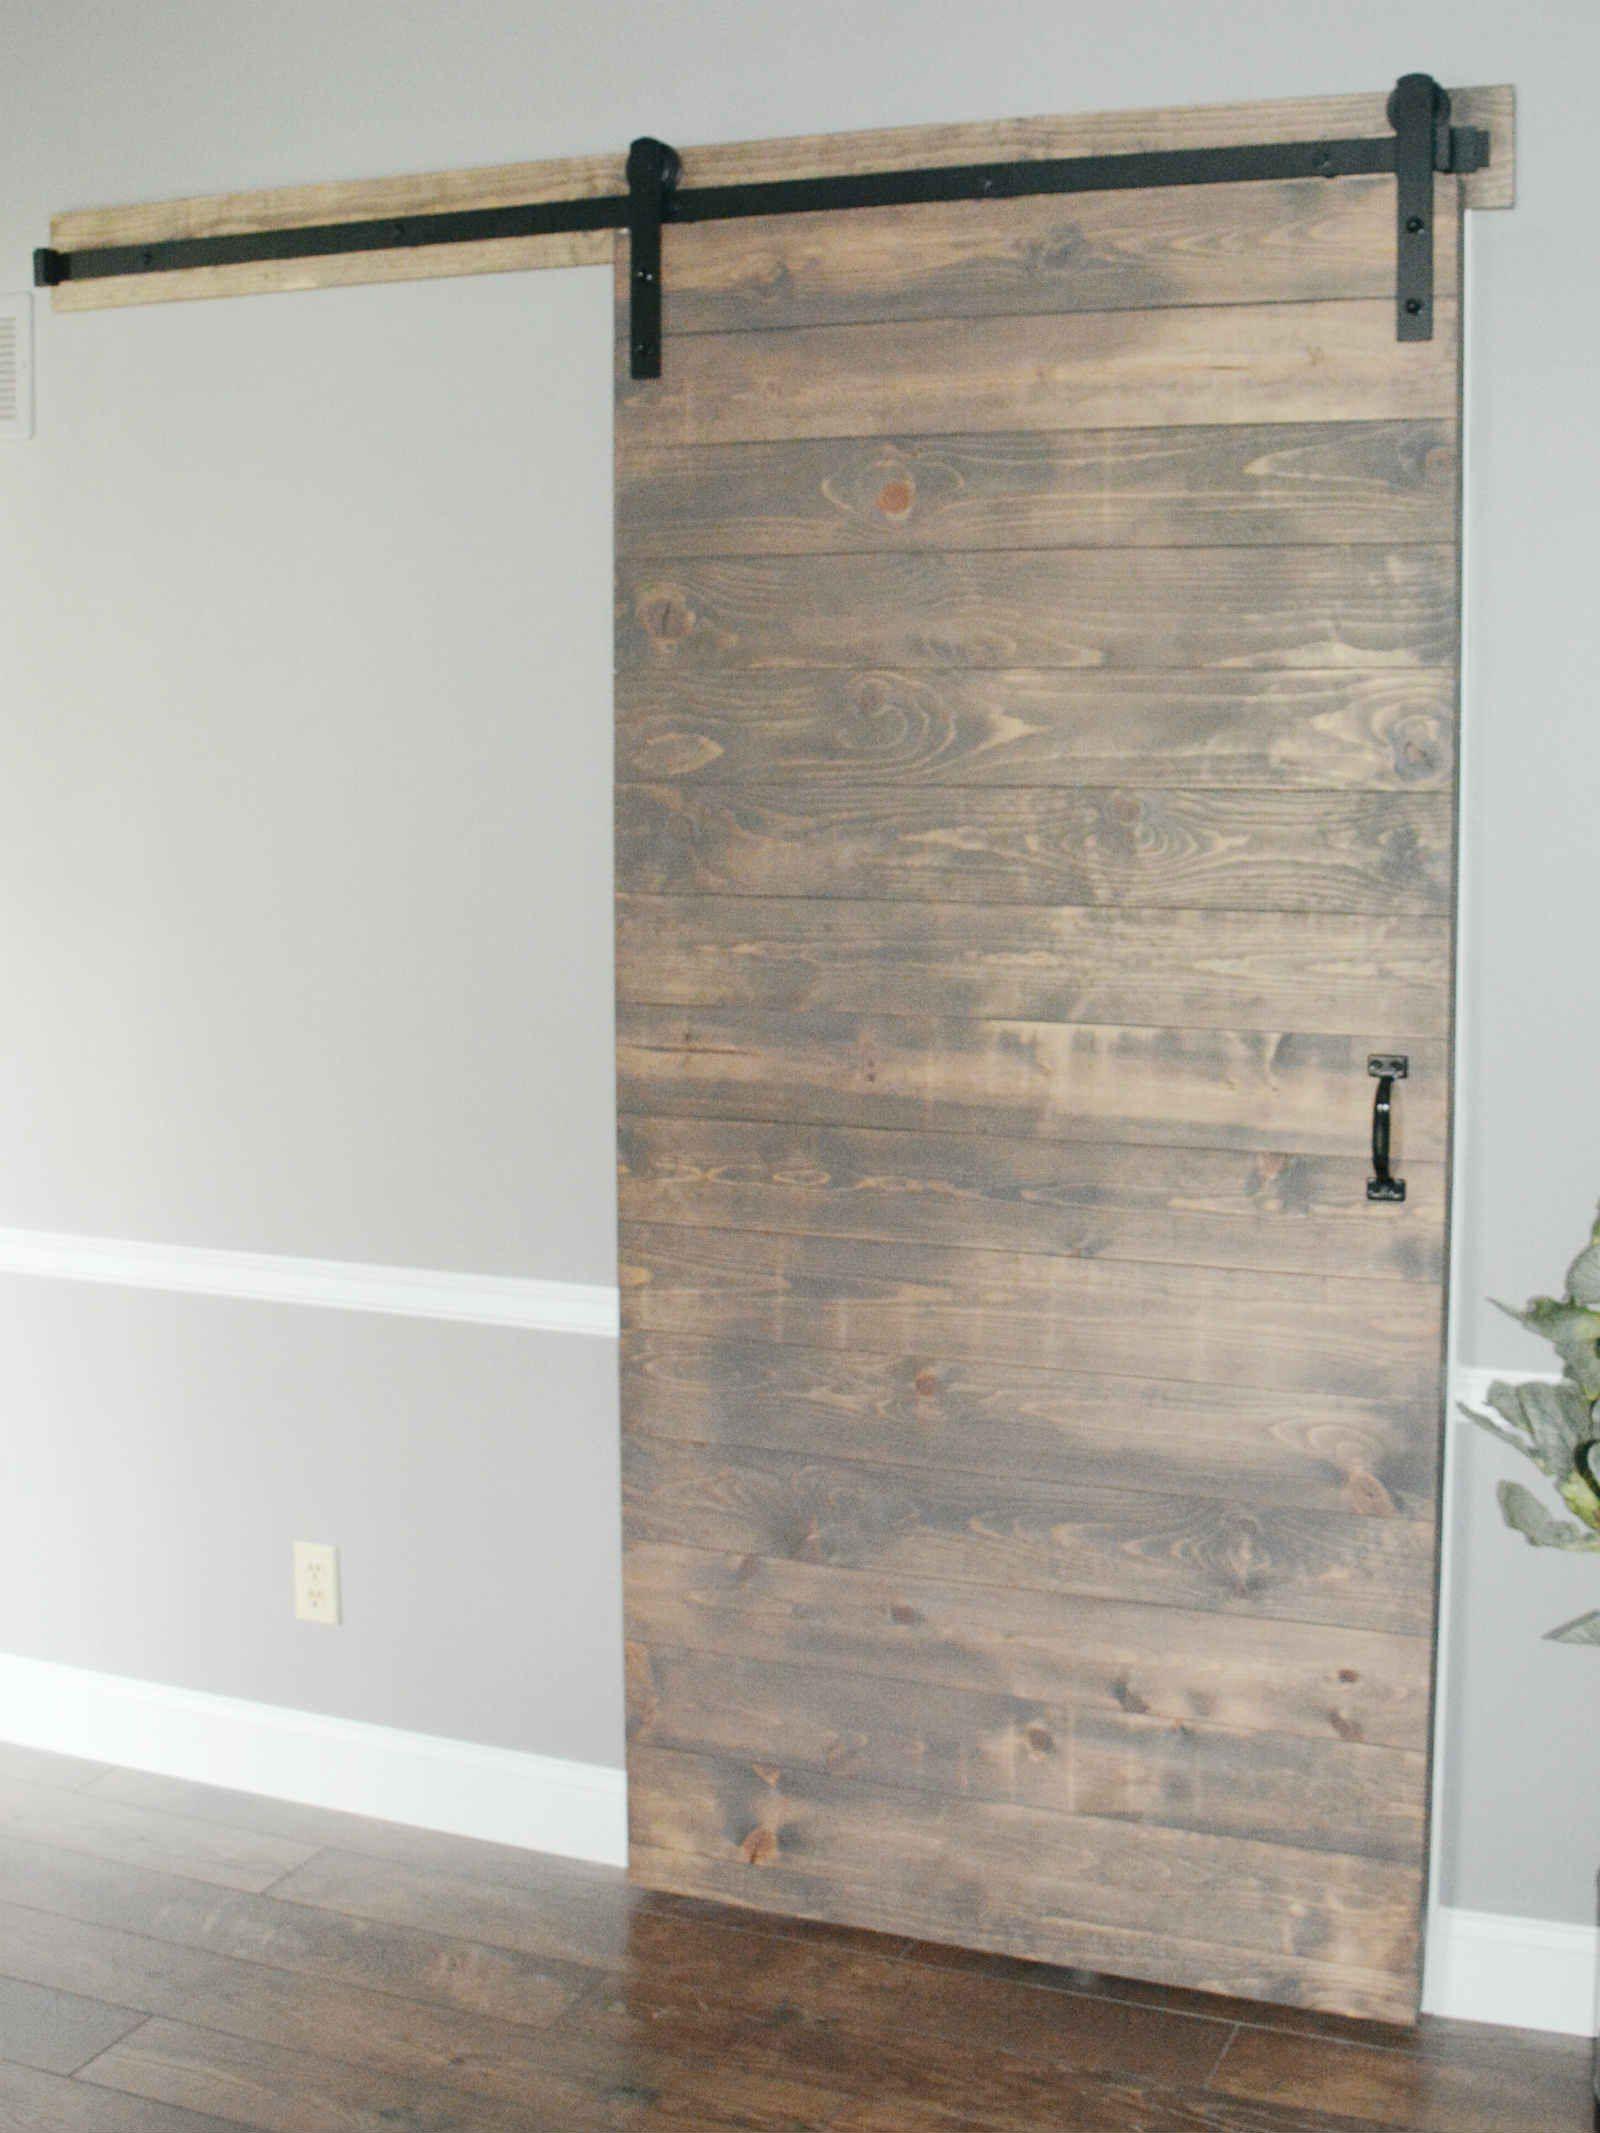 Barn Door Basement Horizontal Plan Plank Construction In 2020 Sliding Doors Interior Barn Doors Sliding Barn Door